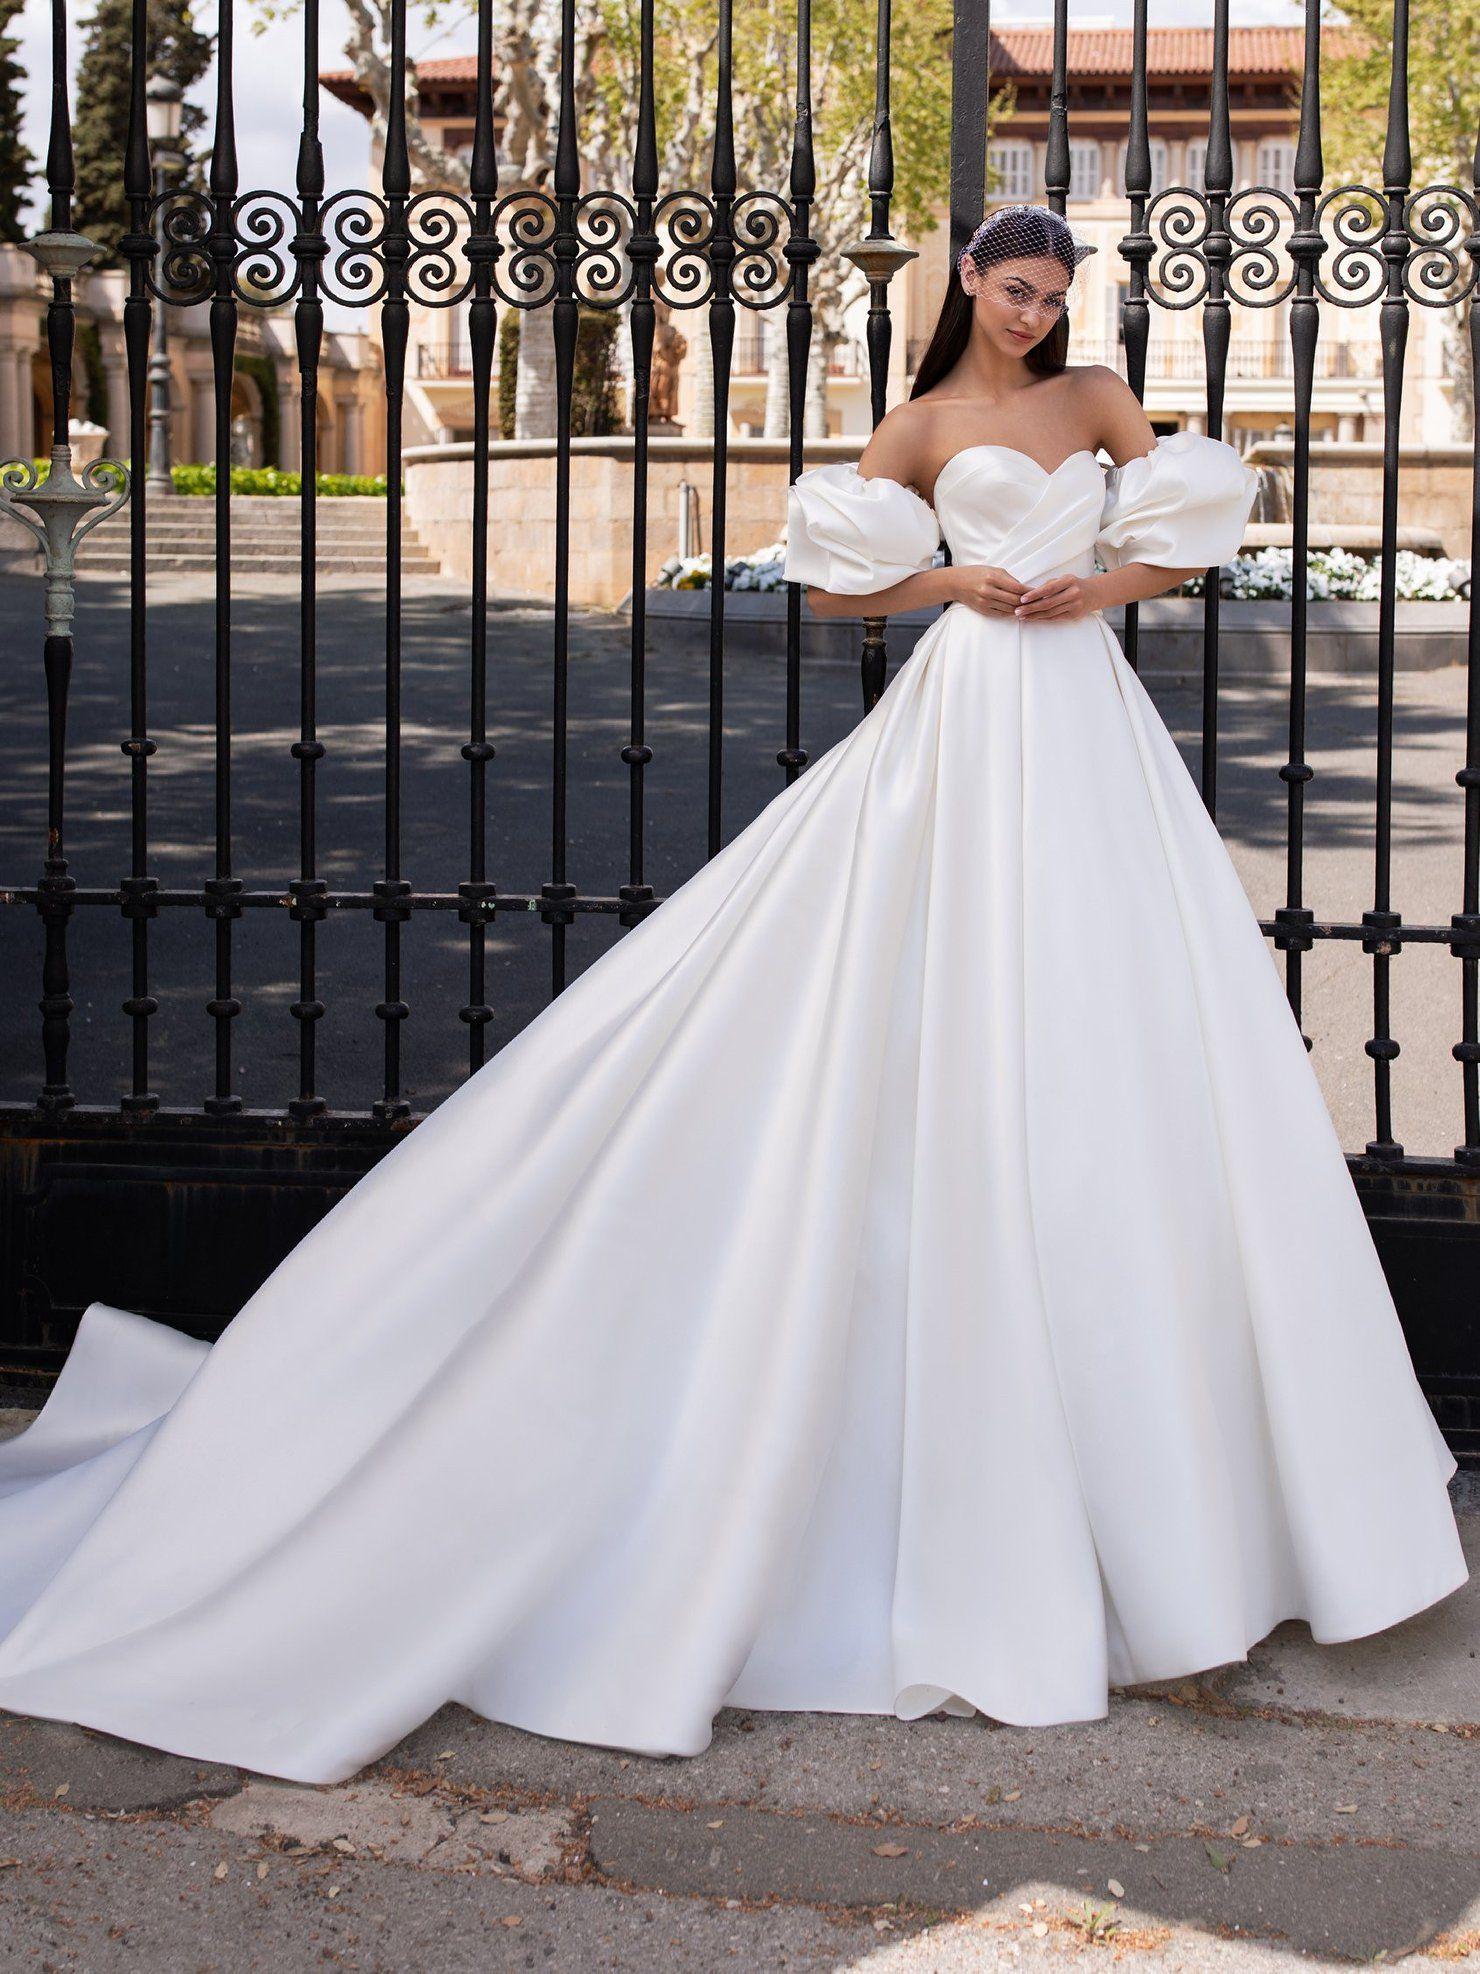 Princess Gown Pronovias Wedding Dress Wedding Dresses Romantic Princess Wedding Dresses